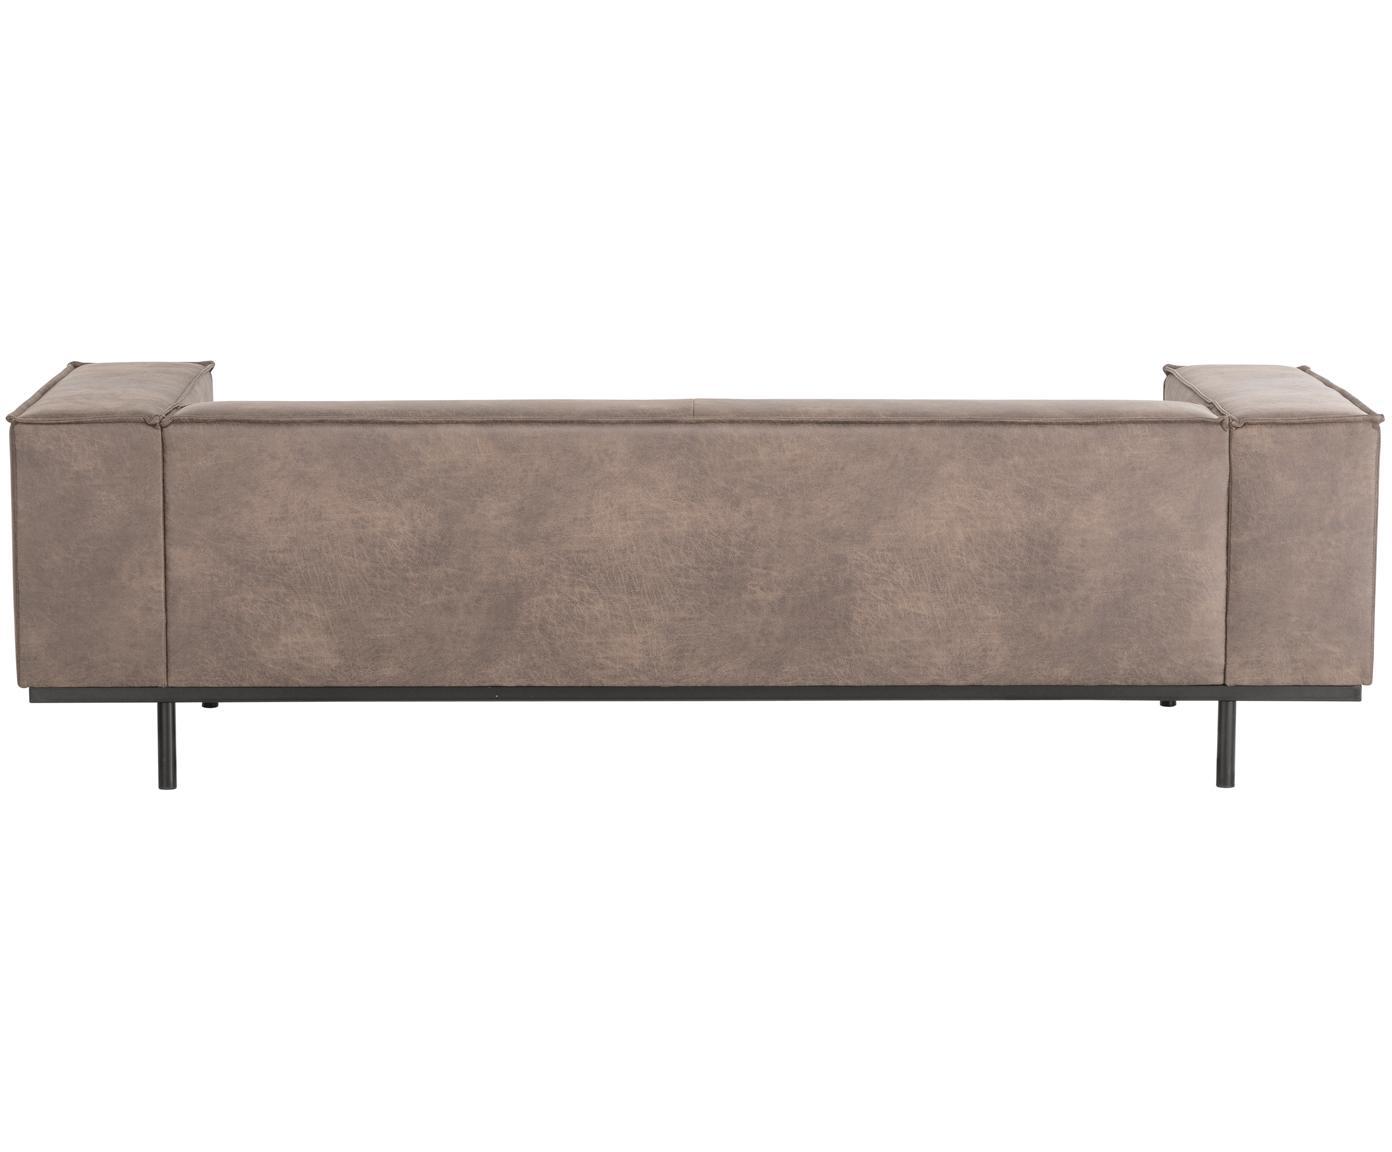 Leder-Sofa Abigail (3-Sitzer), Bezug: Lederfaserstoff (70% Lede, Beine: Stahl, lackiert, Leder Cognac, B 230 x T 95 cm